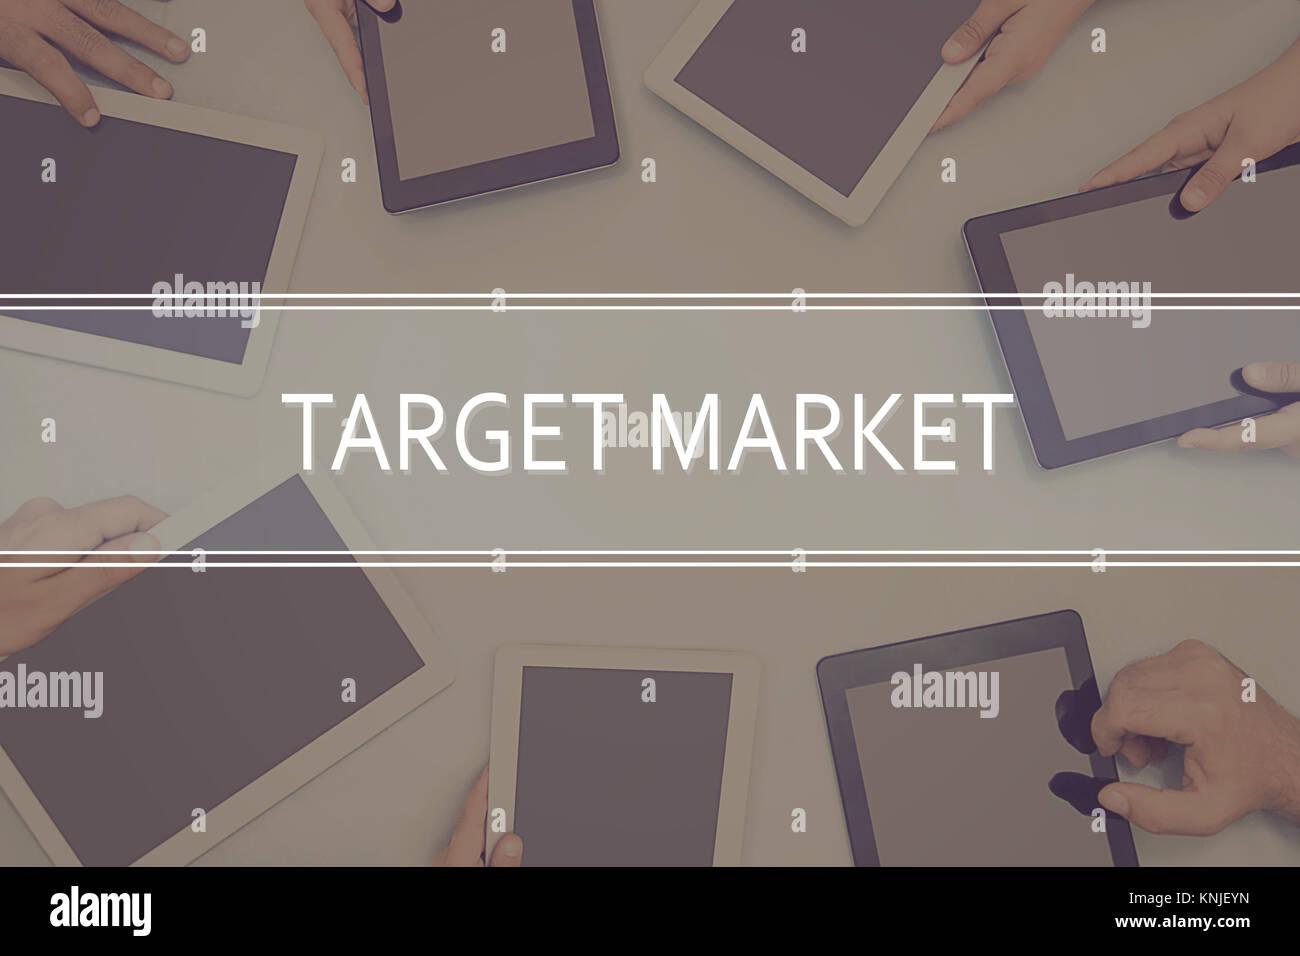 TARGET MARKET CONCEPT Business Concept. - Stock Image